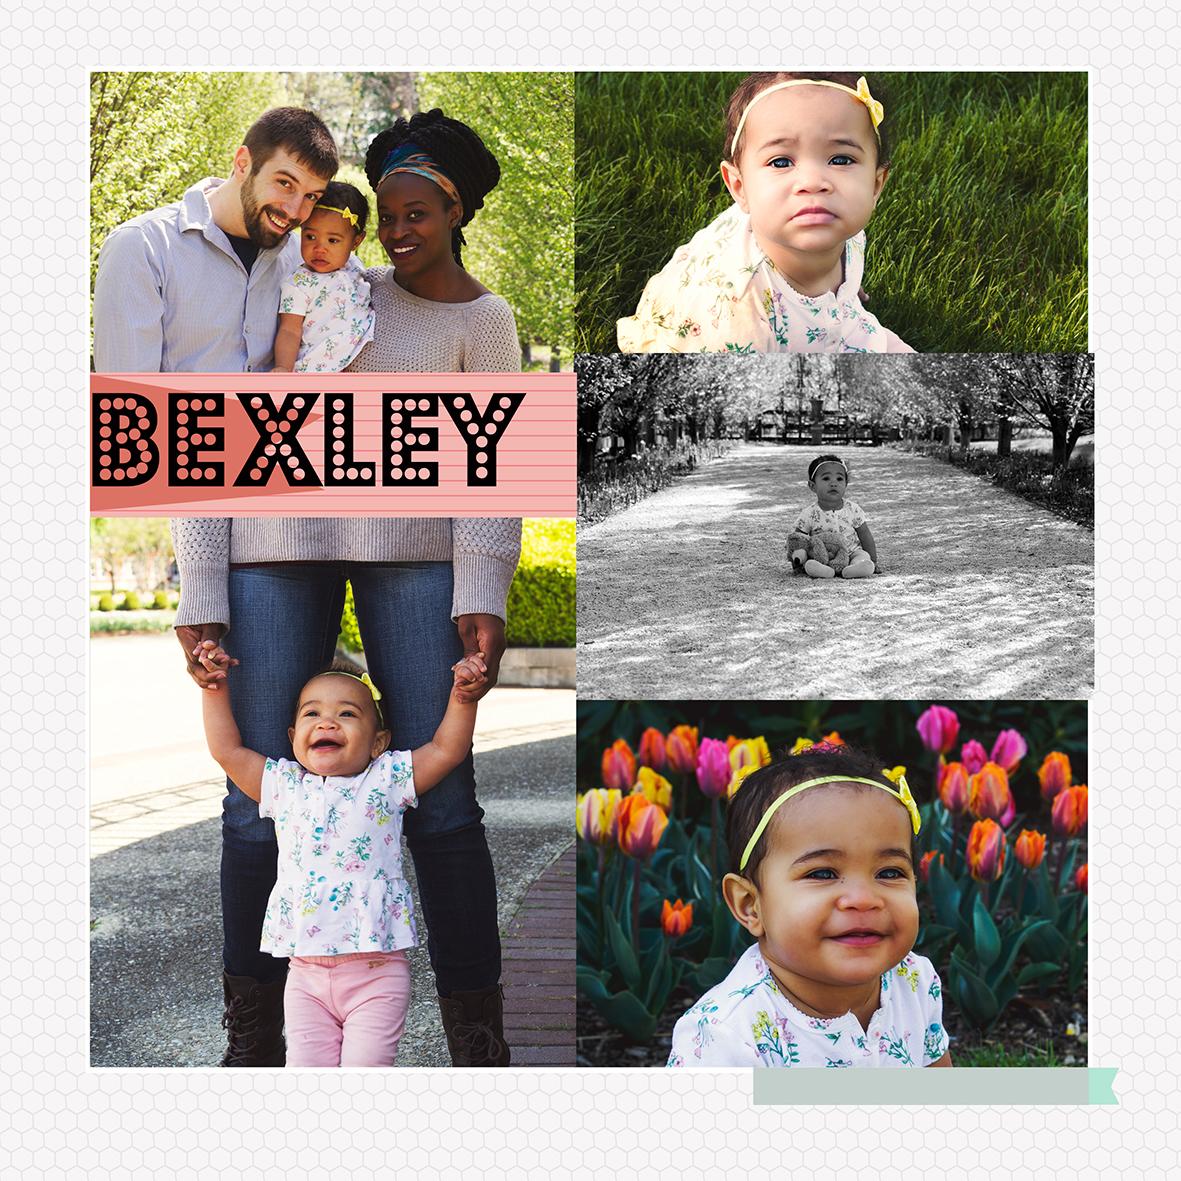 bexley8x8storyboardsm.jpg